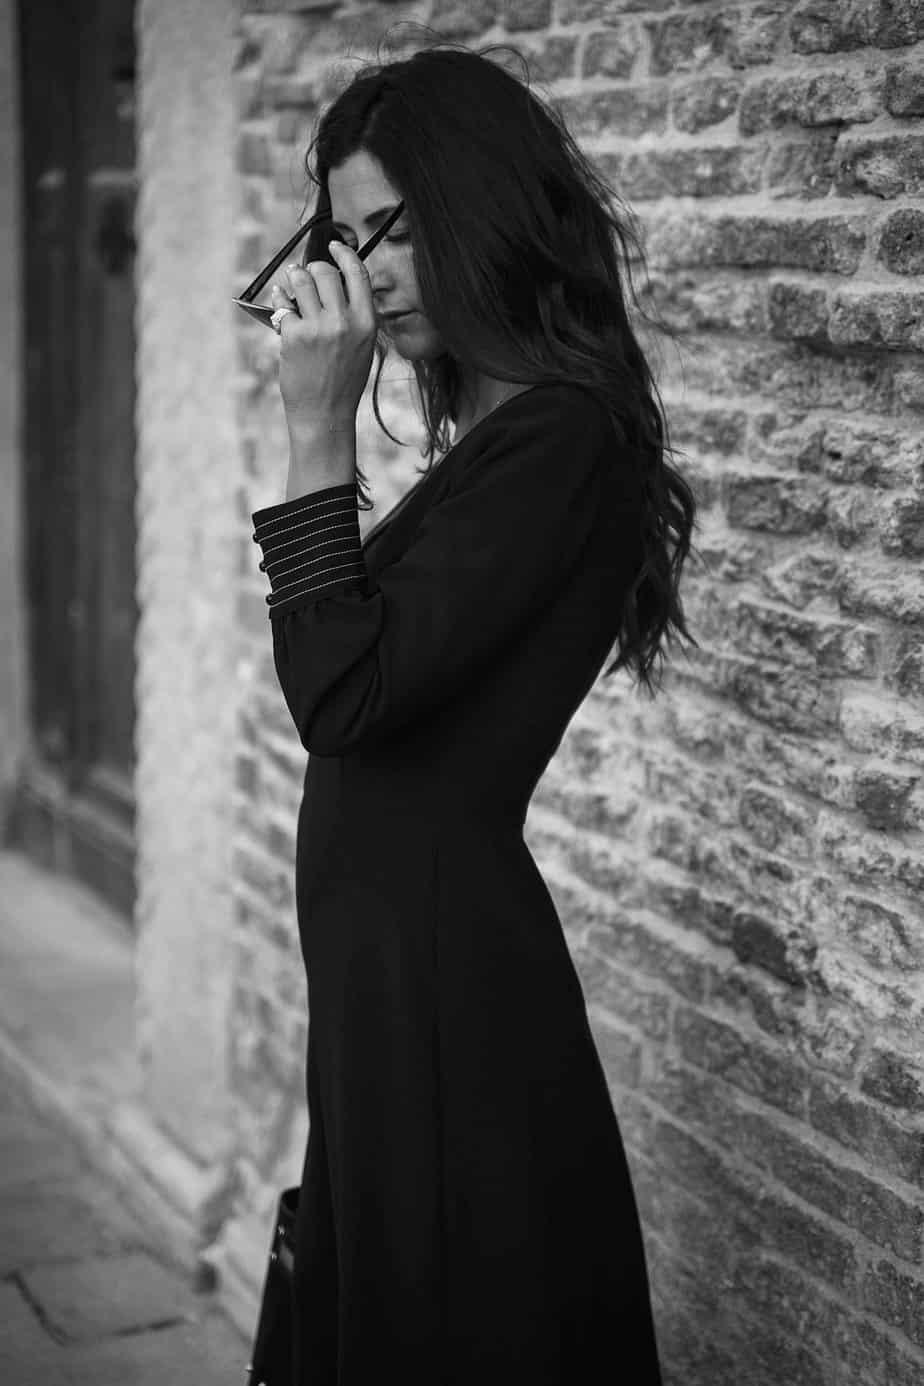 Fiamma_PasquaWine_venezia_blackandwhite